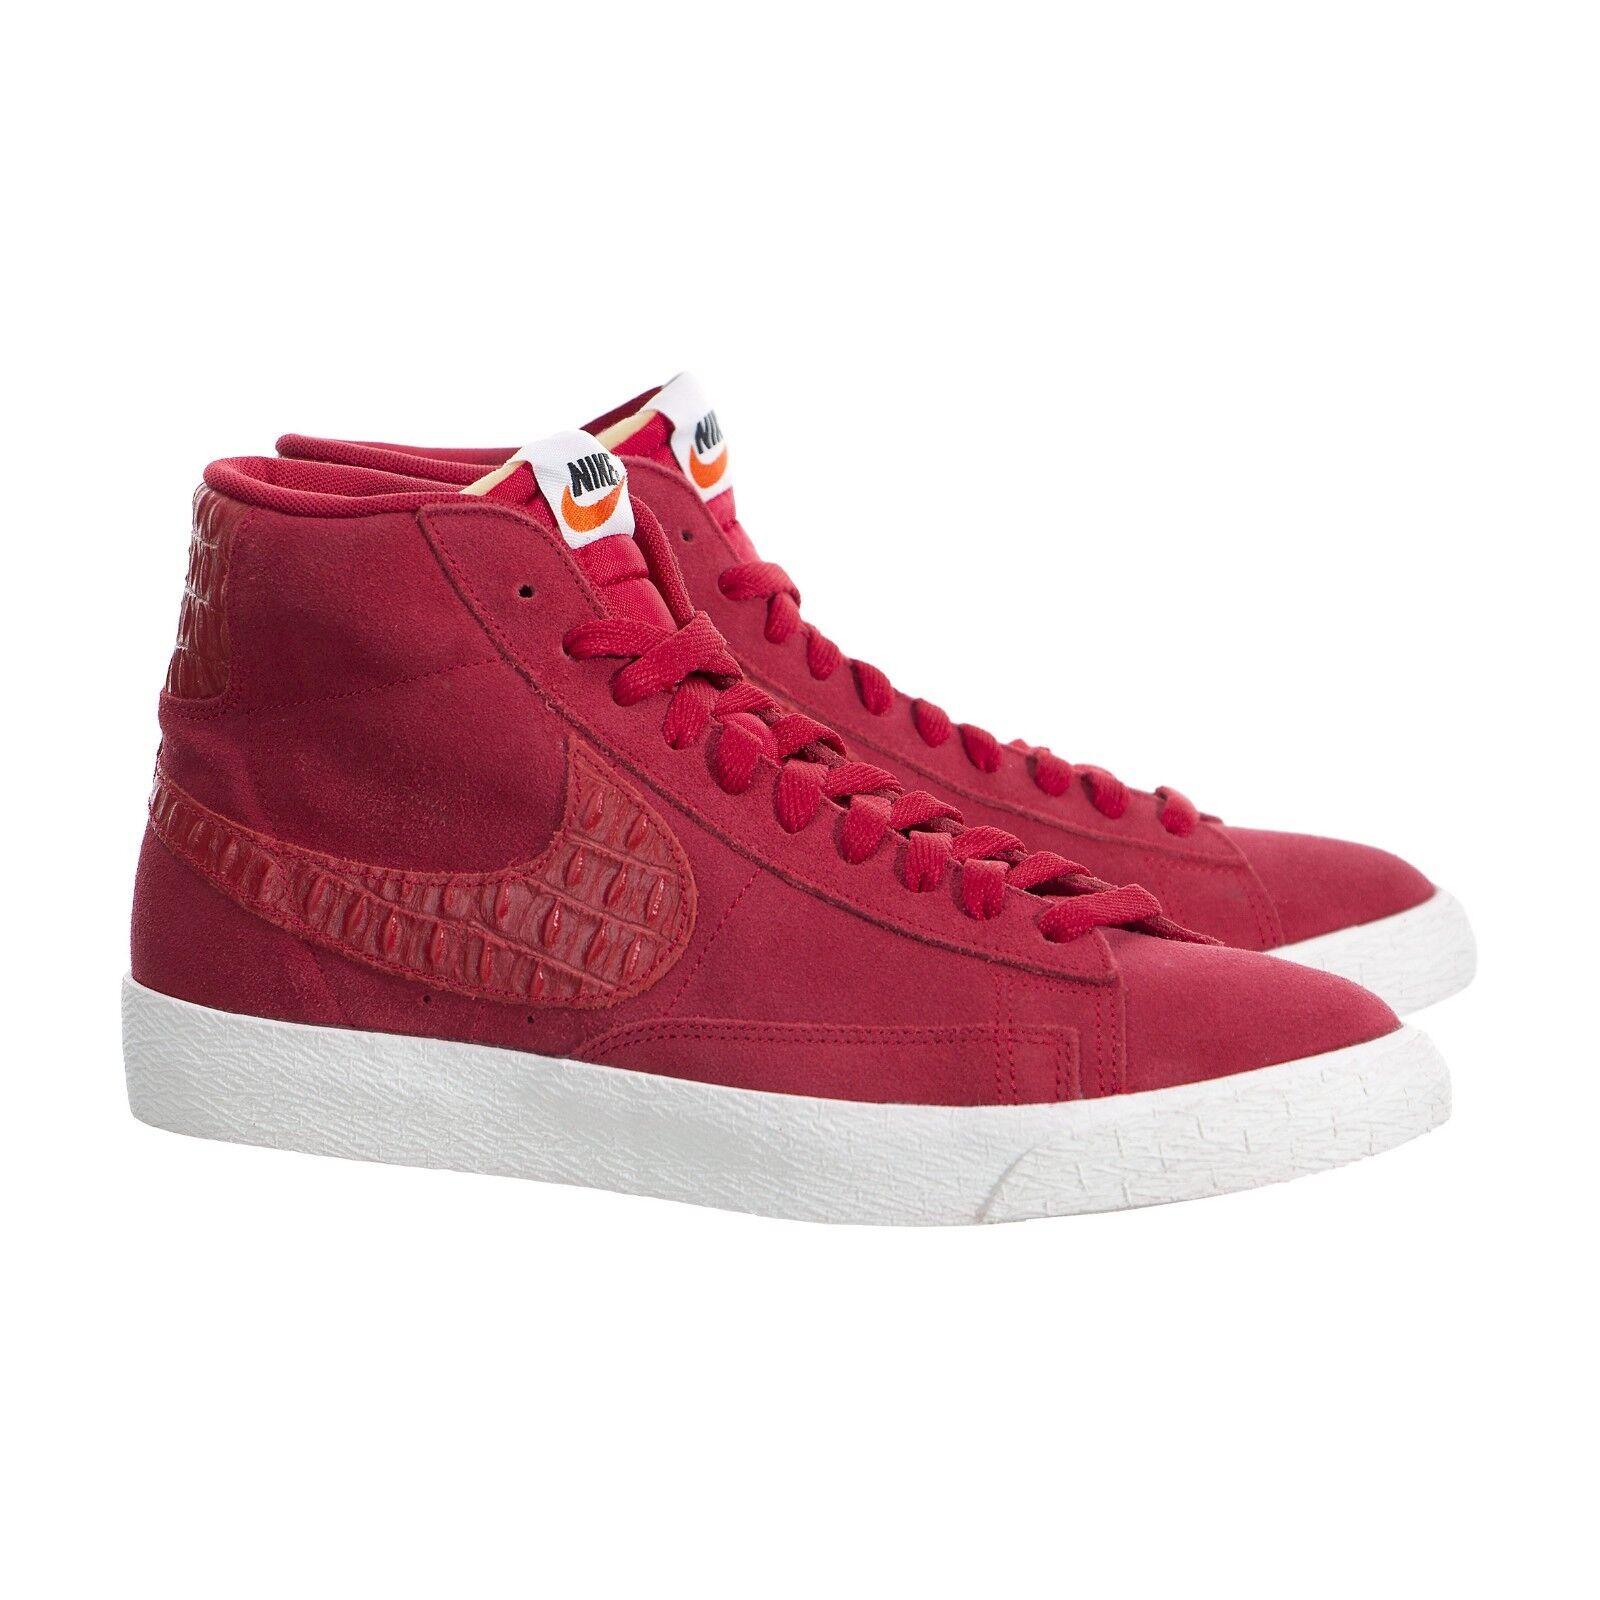 Nuove nike Uomo blazer metà premio scarpe vintage palestra red 638261-601 dimensioni